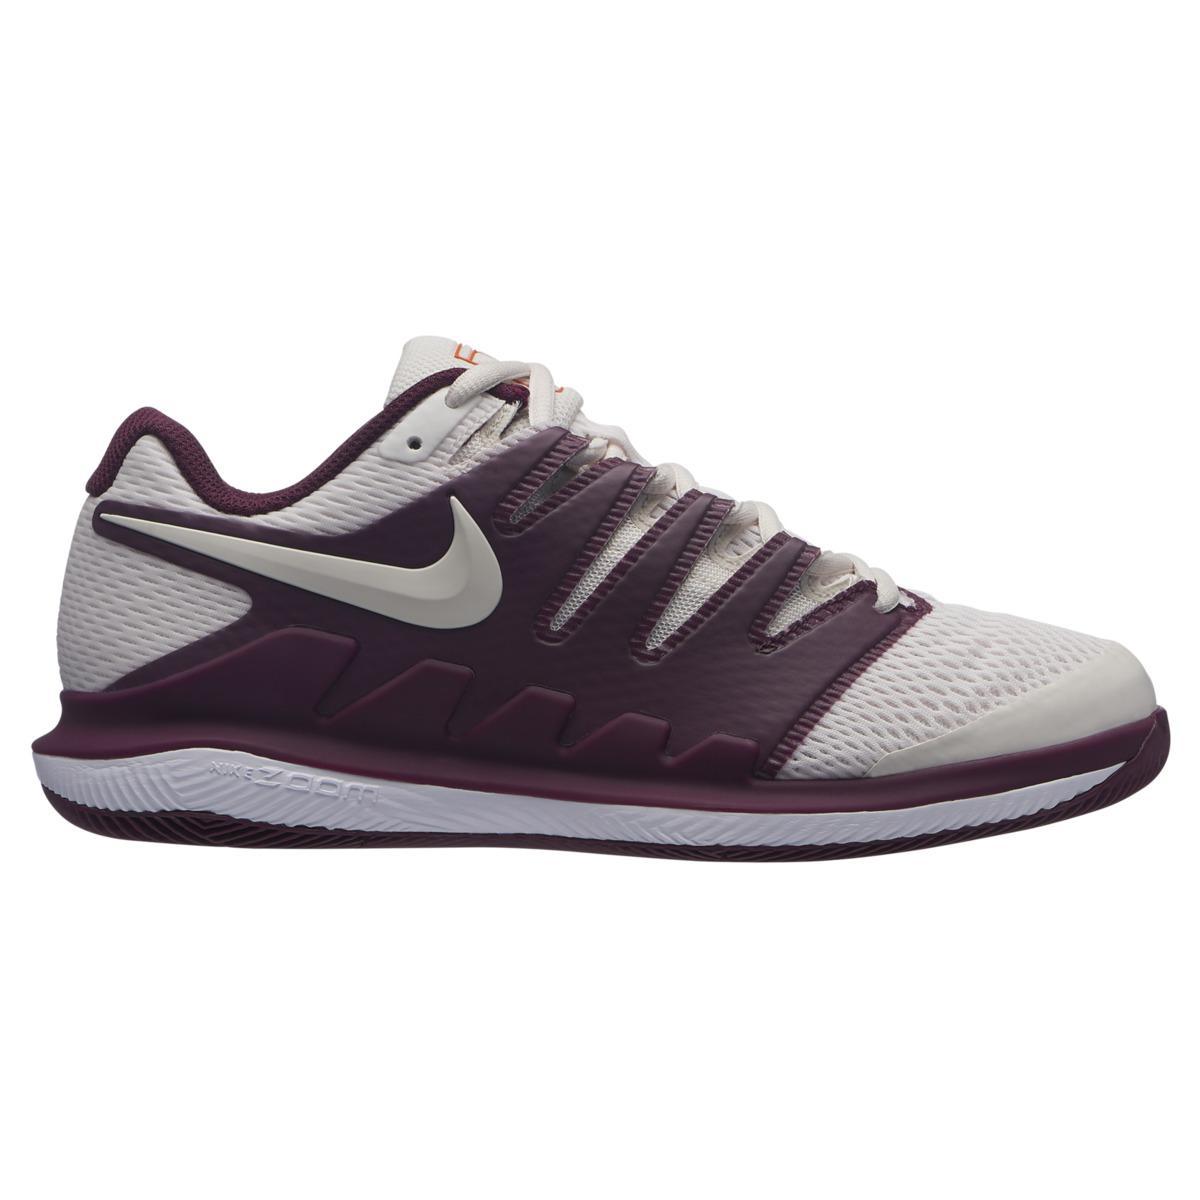 602806f192a9c Nike. Women s Air Zoom Vapor X Tennis Shoes